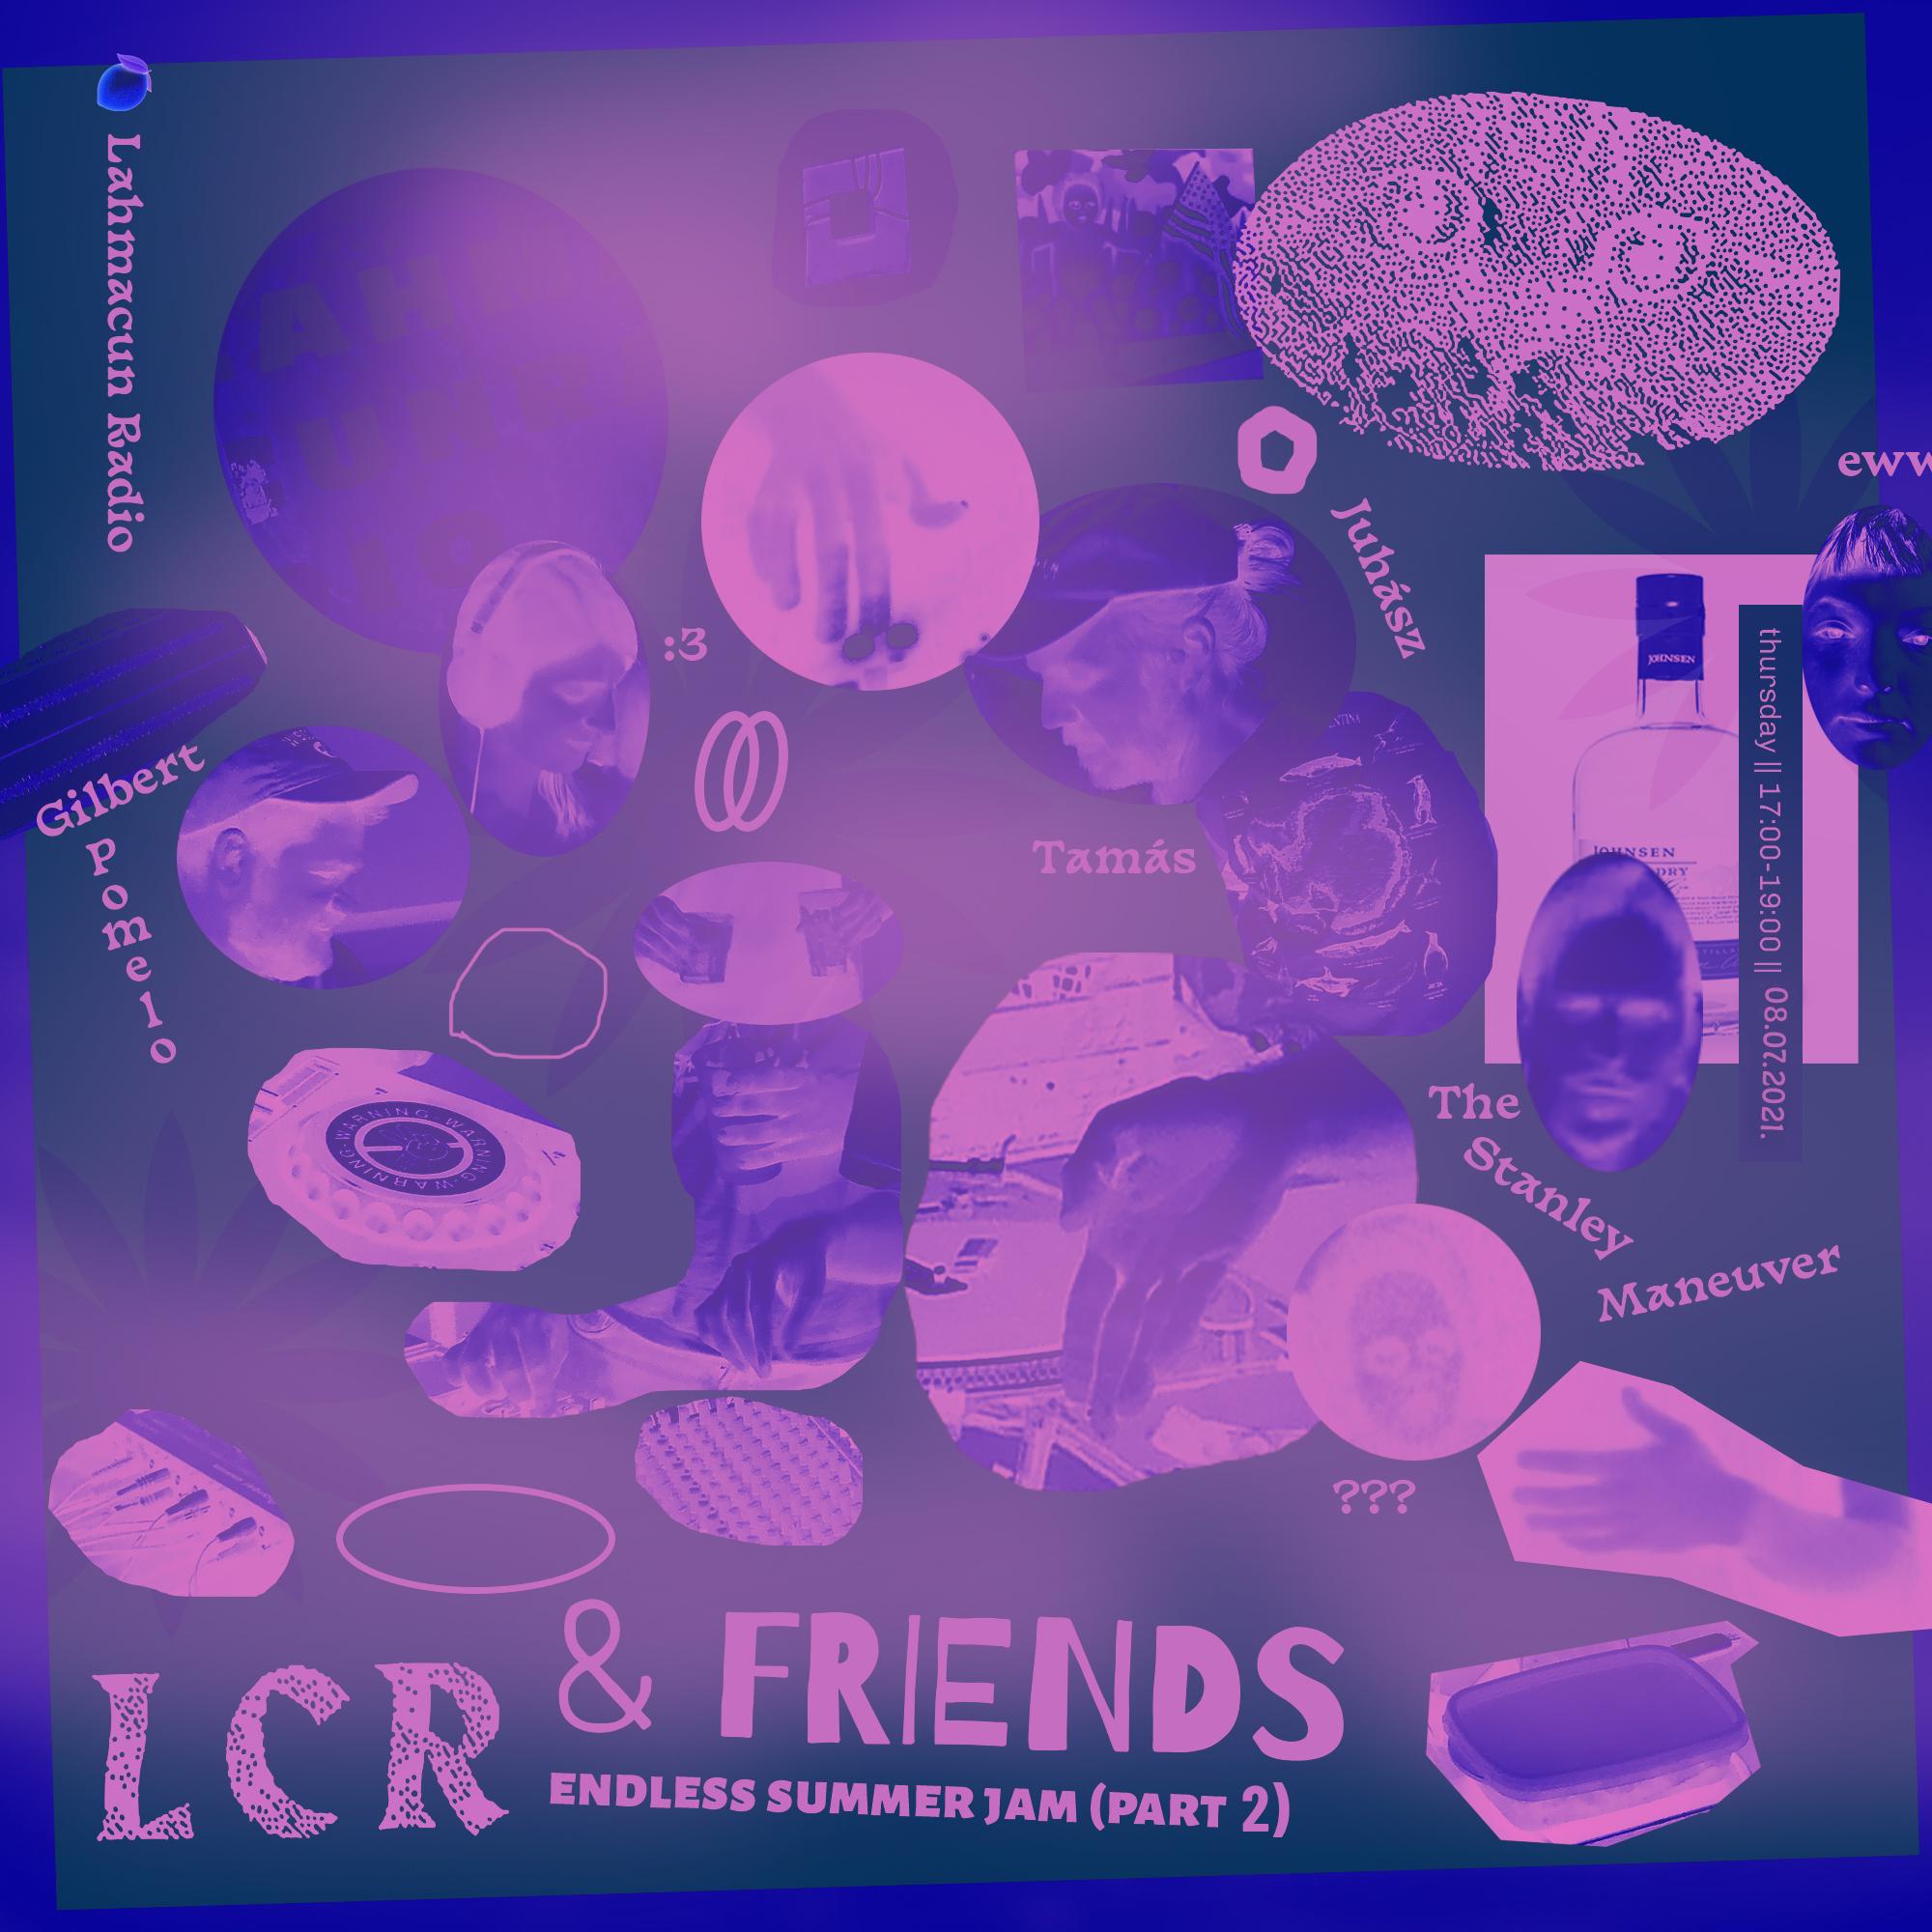 LCR & FRIENDS ~ Endless Summer Jam (Part 2) /// @ Lahmacun Radio /// [08.07.21]